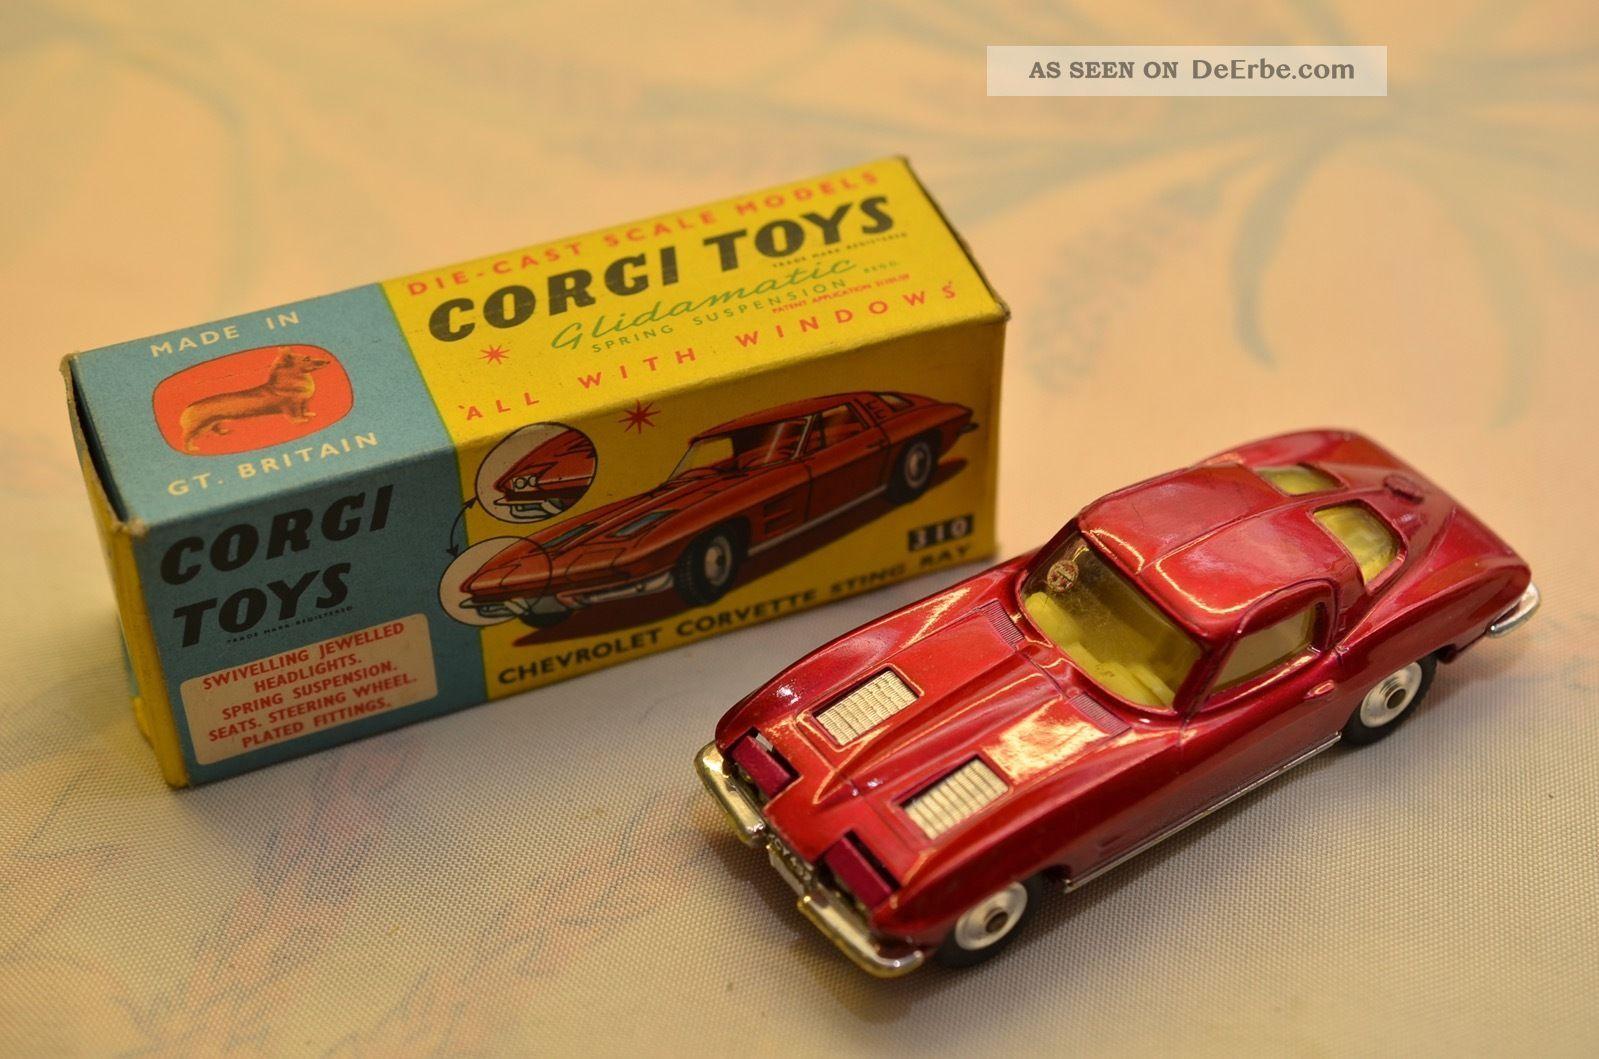 Sammlerstück Corgi Toys 310 Chevrolet Corvette Sting Ray Fahrzeuge Bild